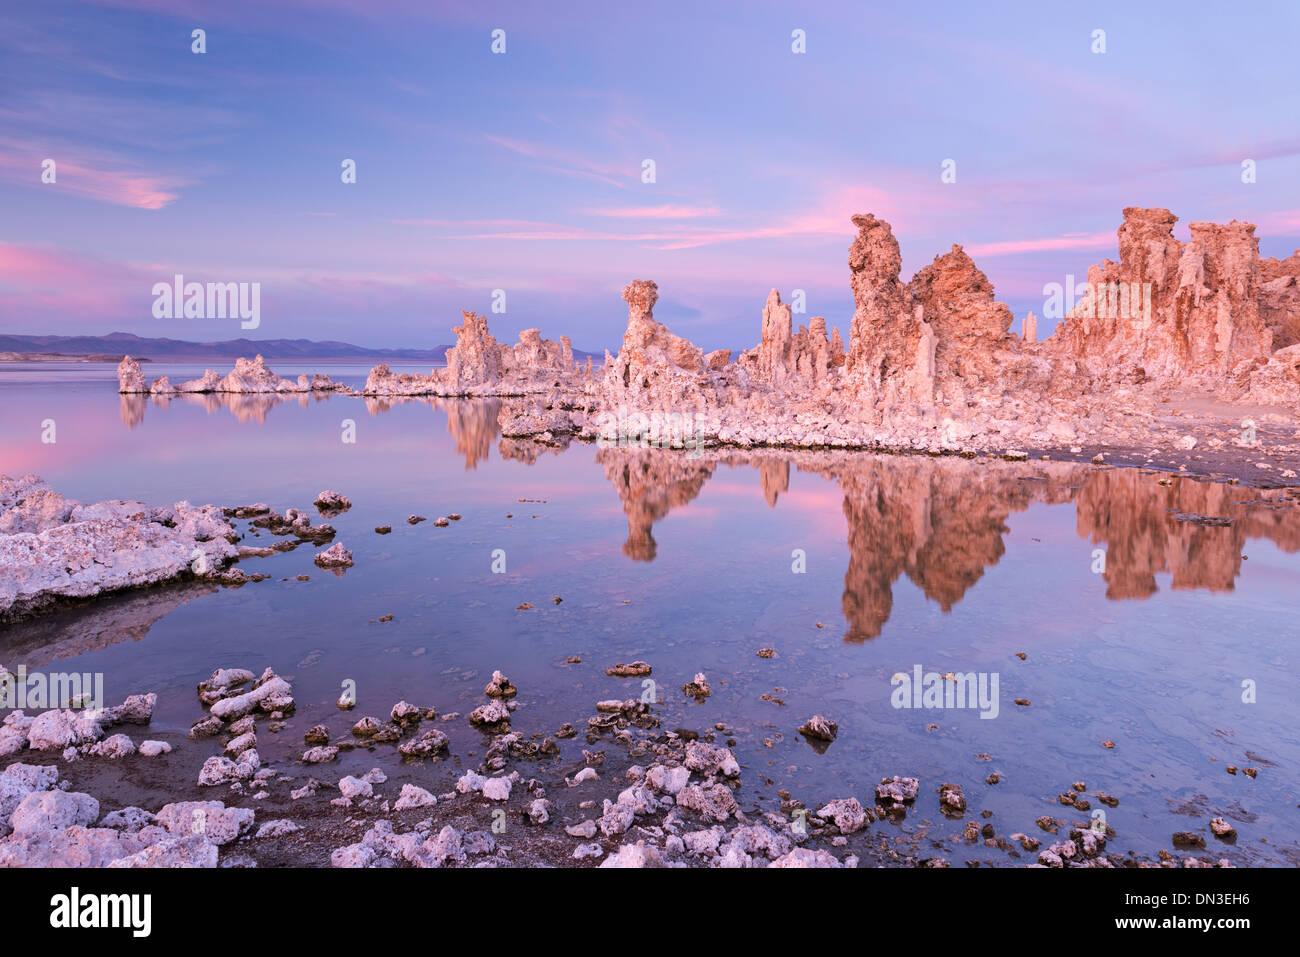 Mono Lake tufa towers at sunset, California, USA. Autumn (October) 2013. - Stock Image